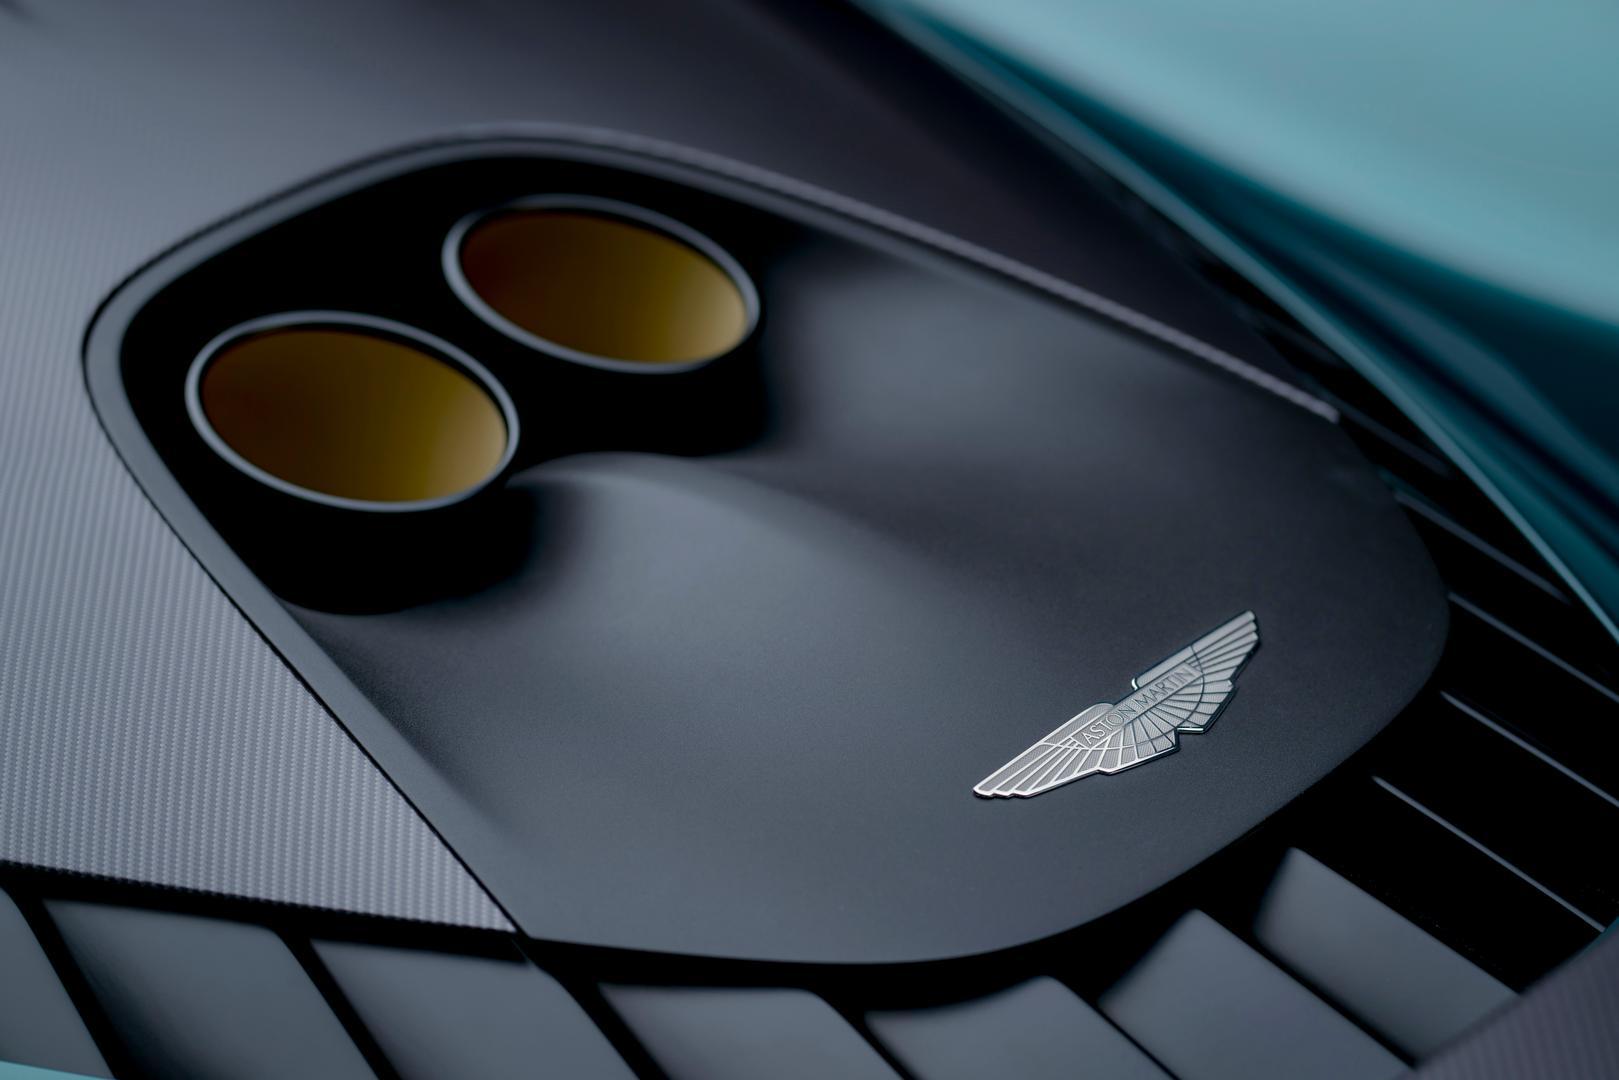 Aston Martin Valhalla exhaust pipes